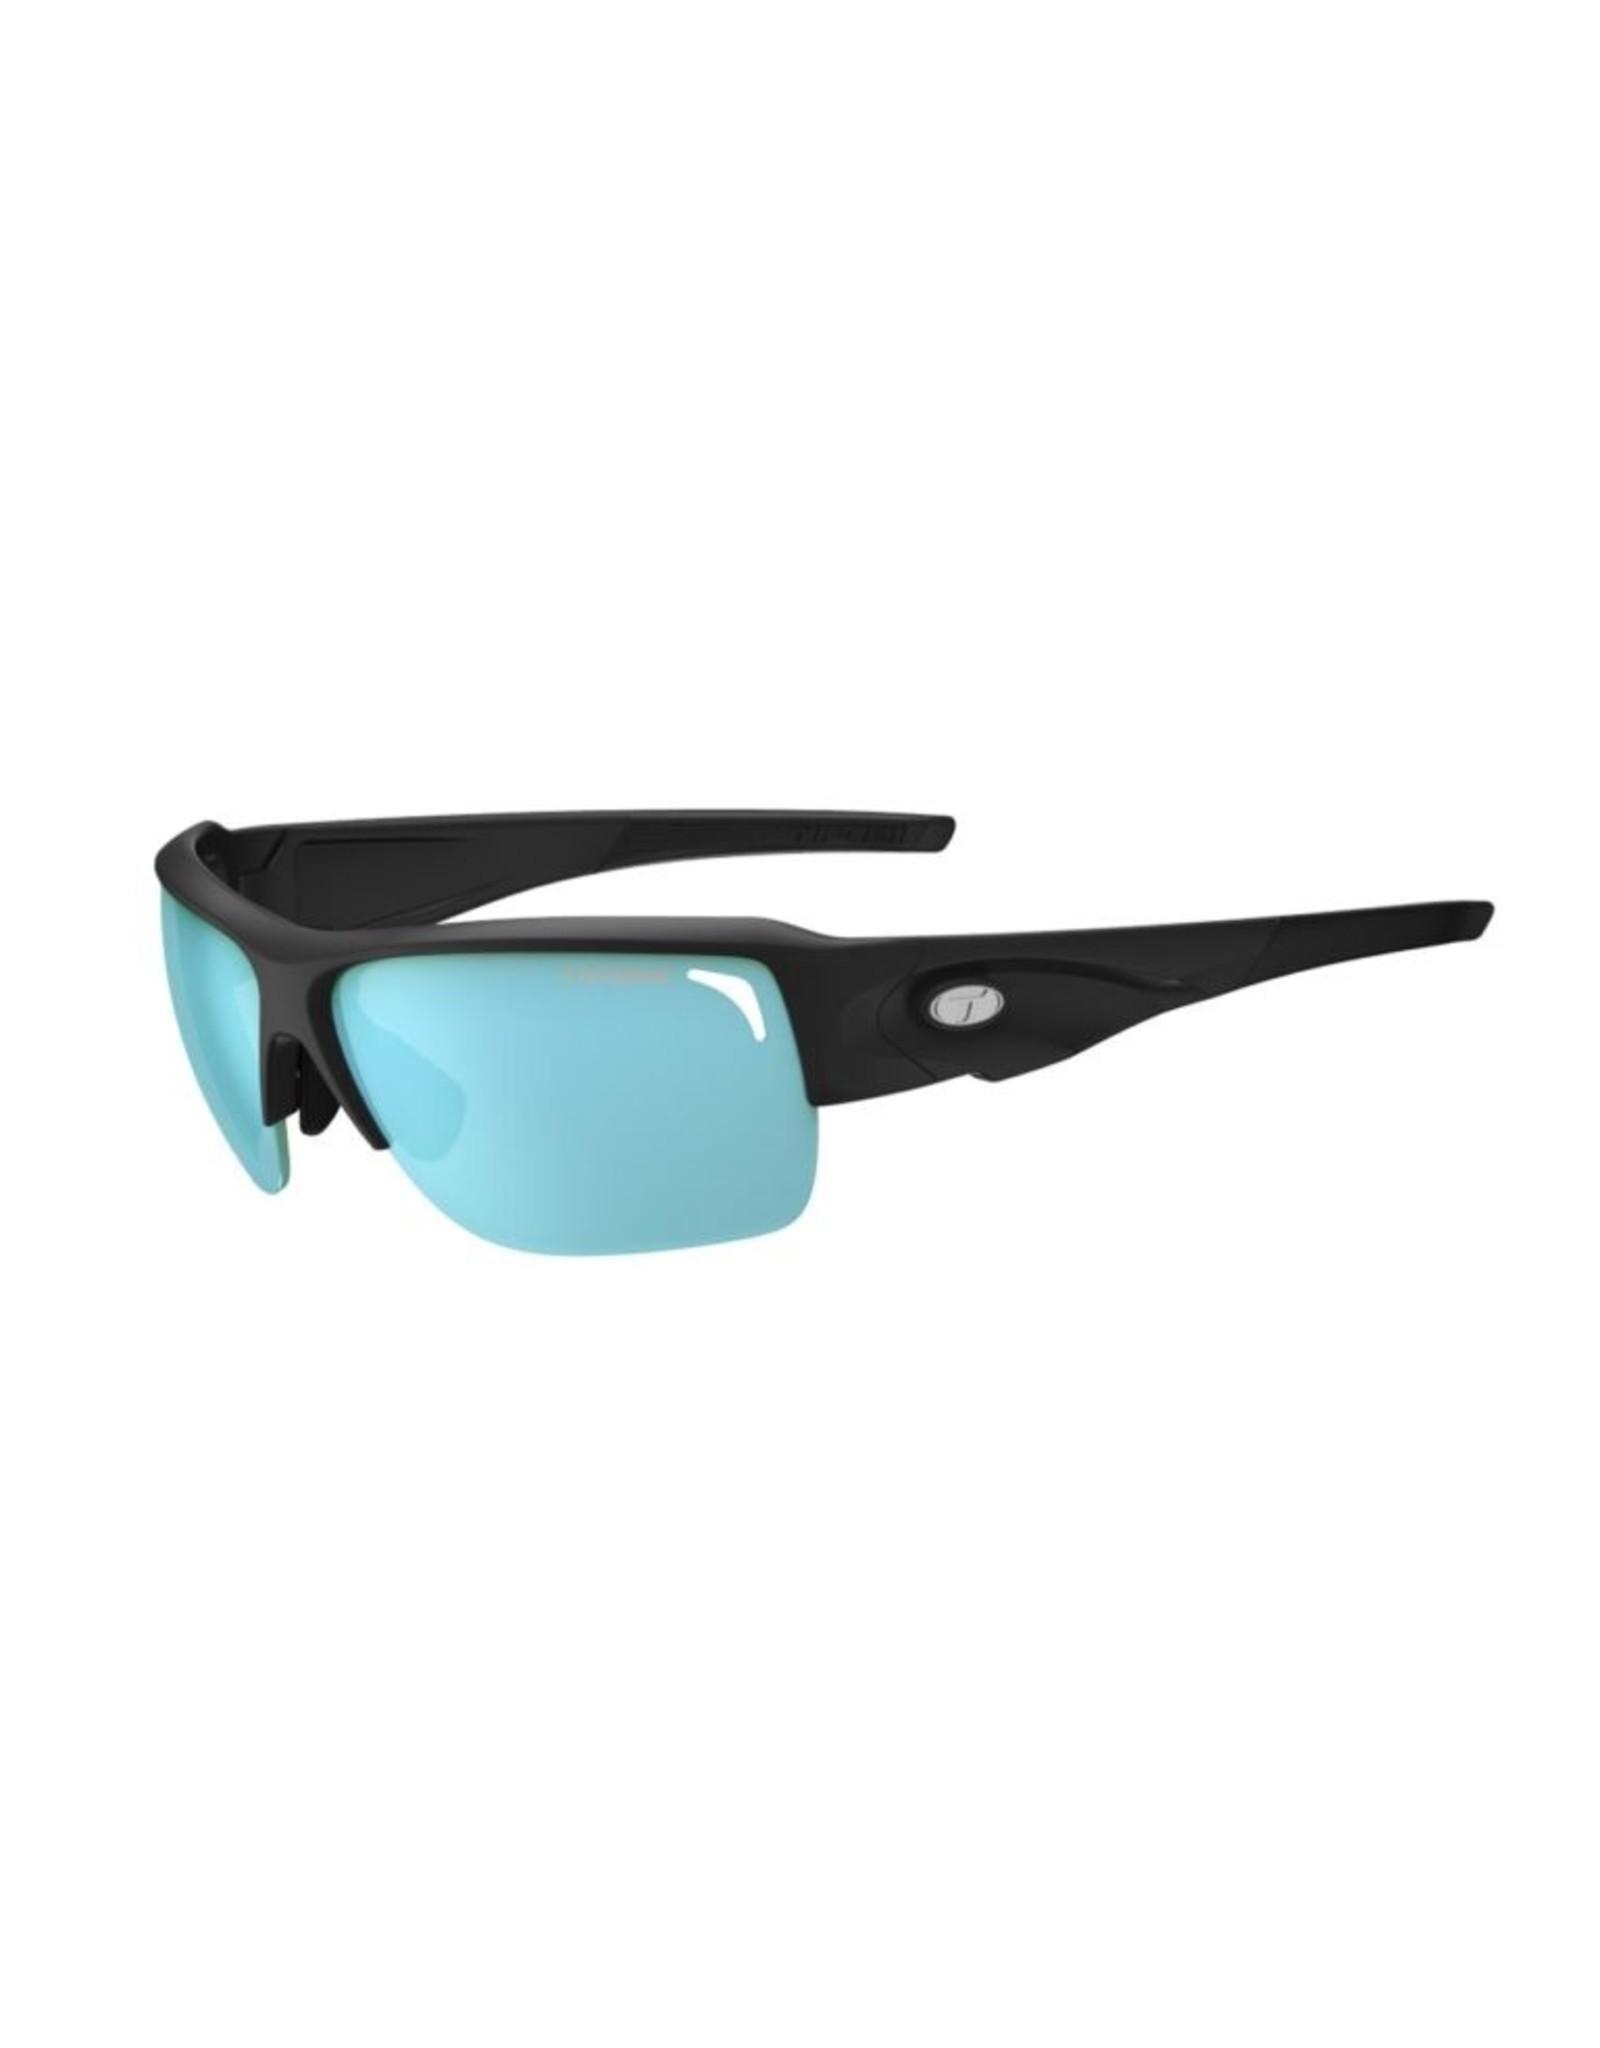 Tifosi Optics Elder SL, Matte Black Polarized Sunglasses - Enliven Off-Shore Polarized